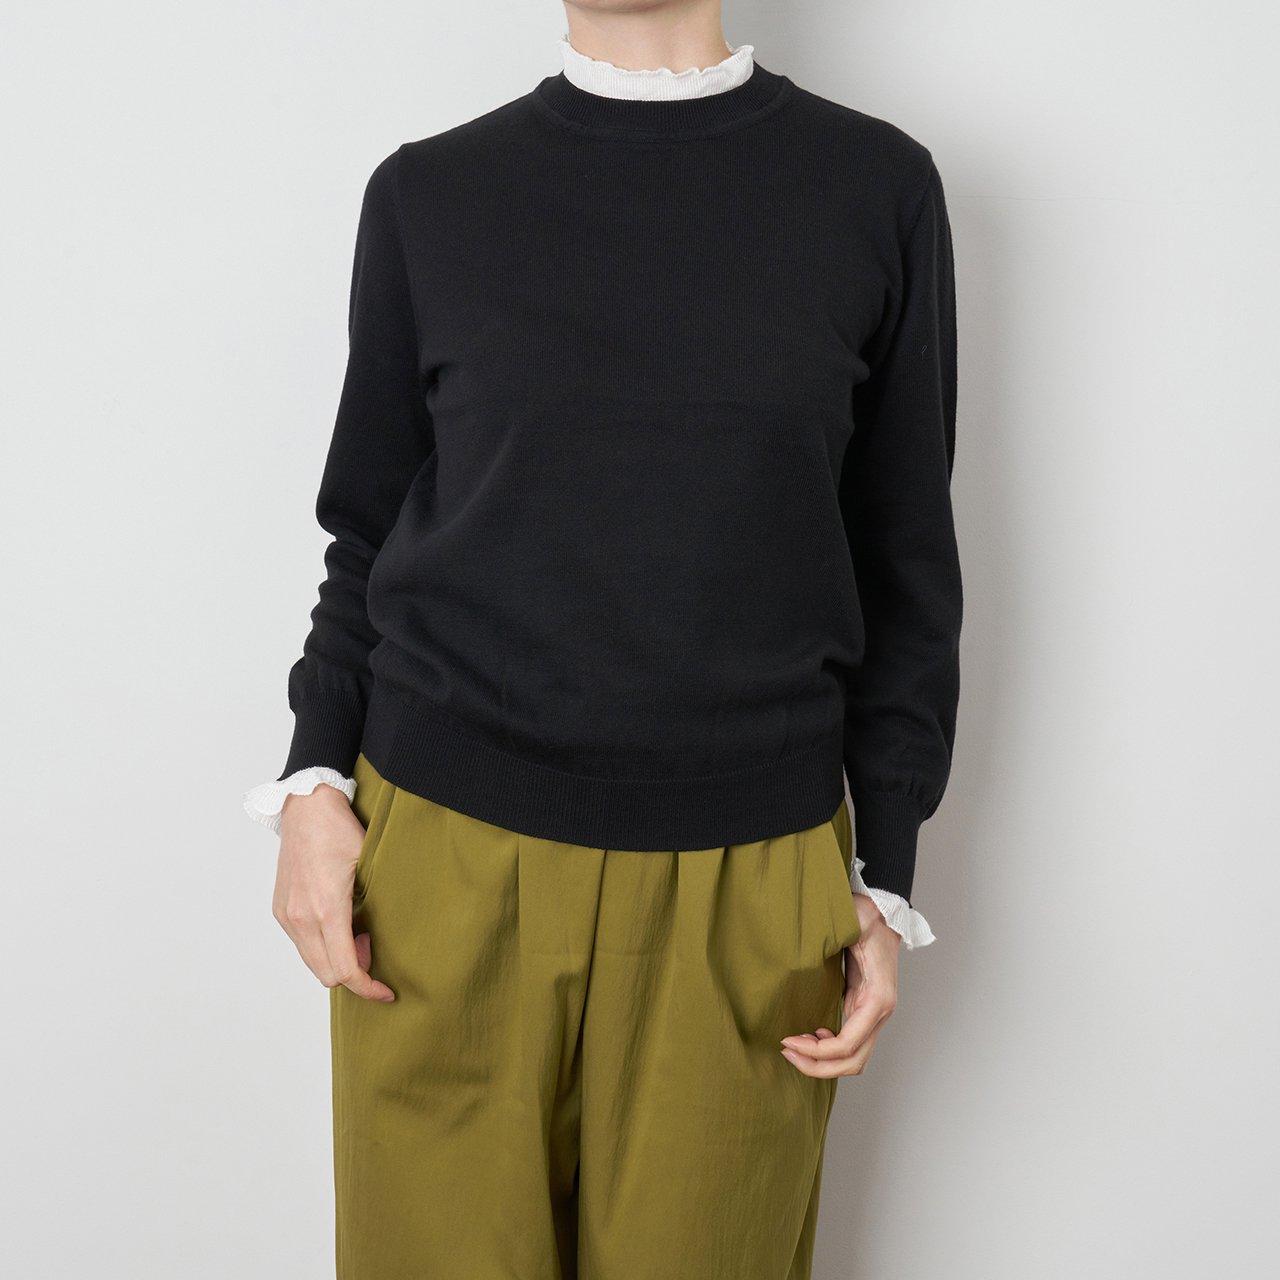 Pale Jute <BR>White frill knit P/O<BR>Black